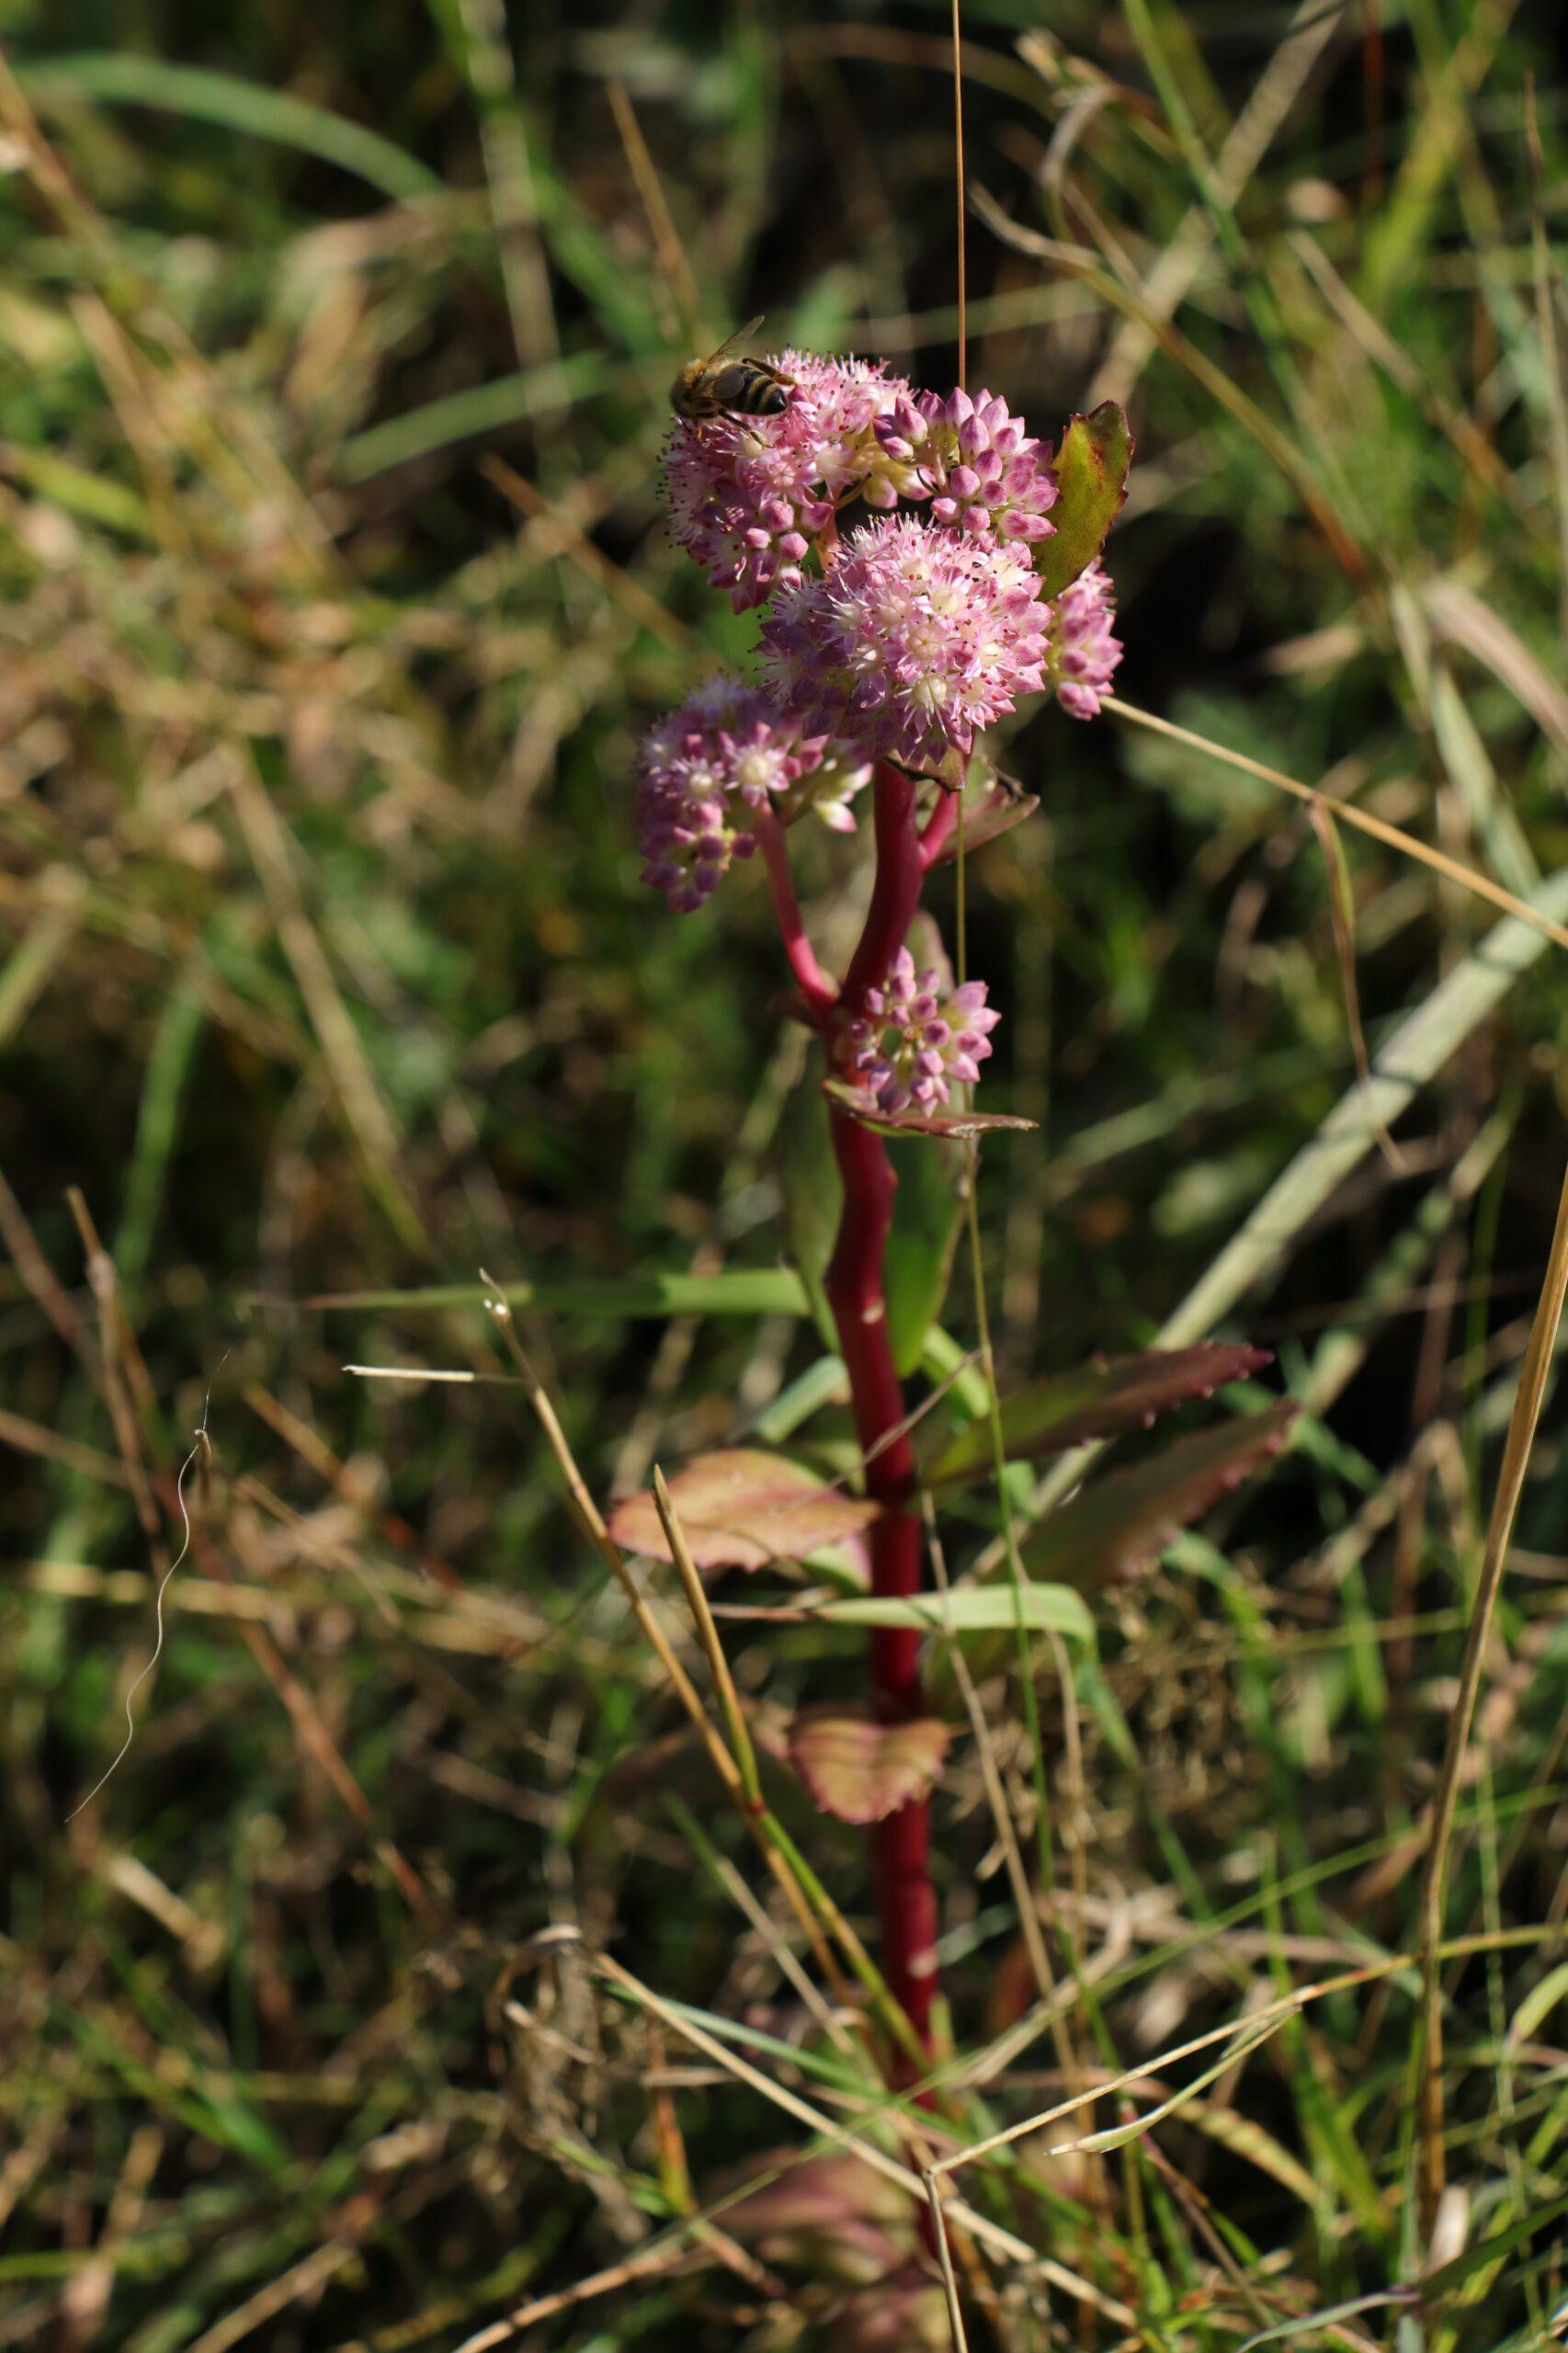 Purpur-Fetthenne - Gesamte Pflanze